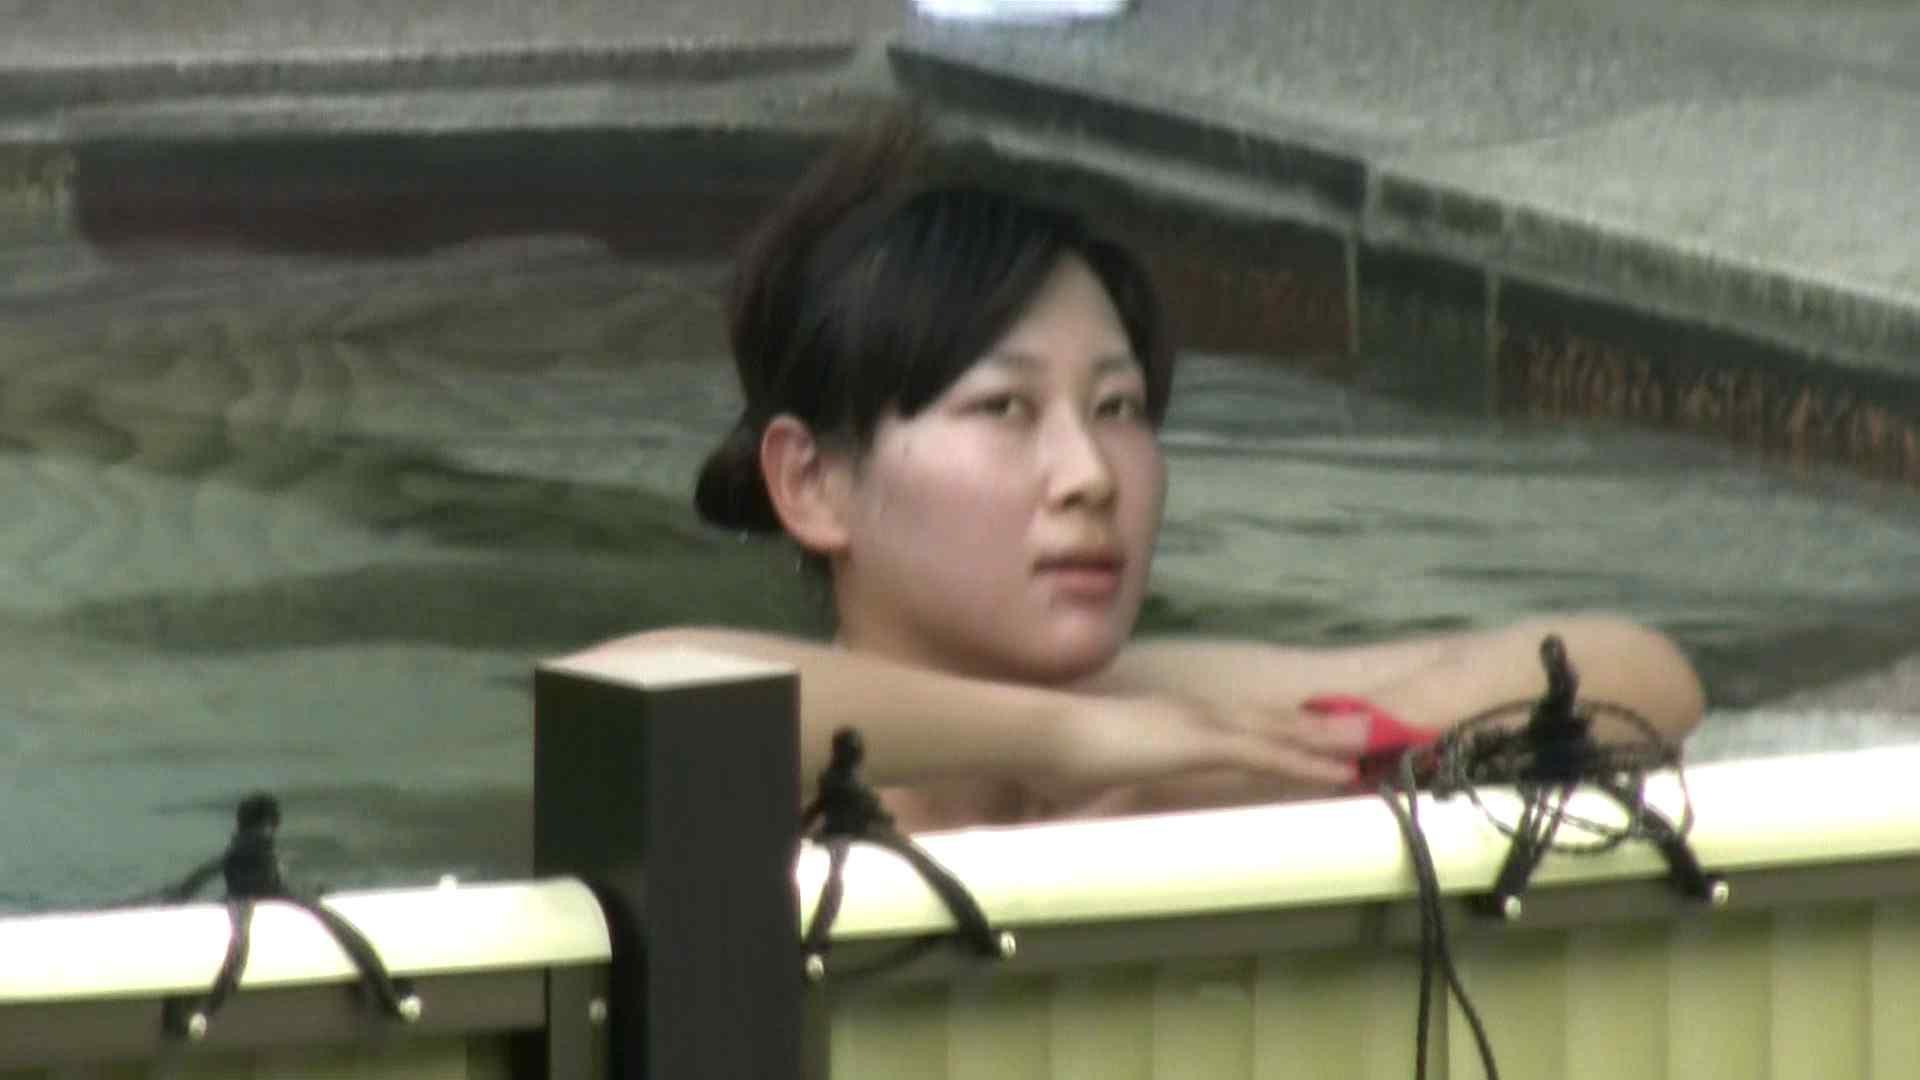 Aquaな露天風呂Vol.665 露天 アダルト動画キャプチャ 85枚 65